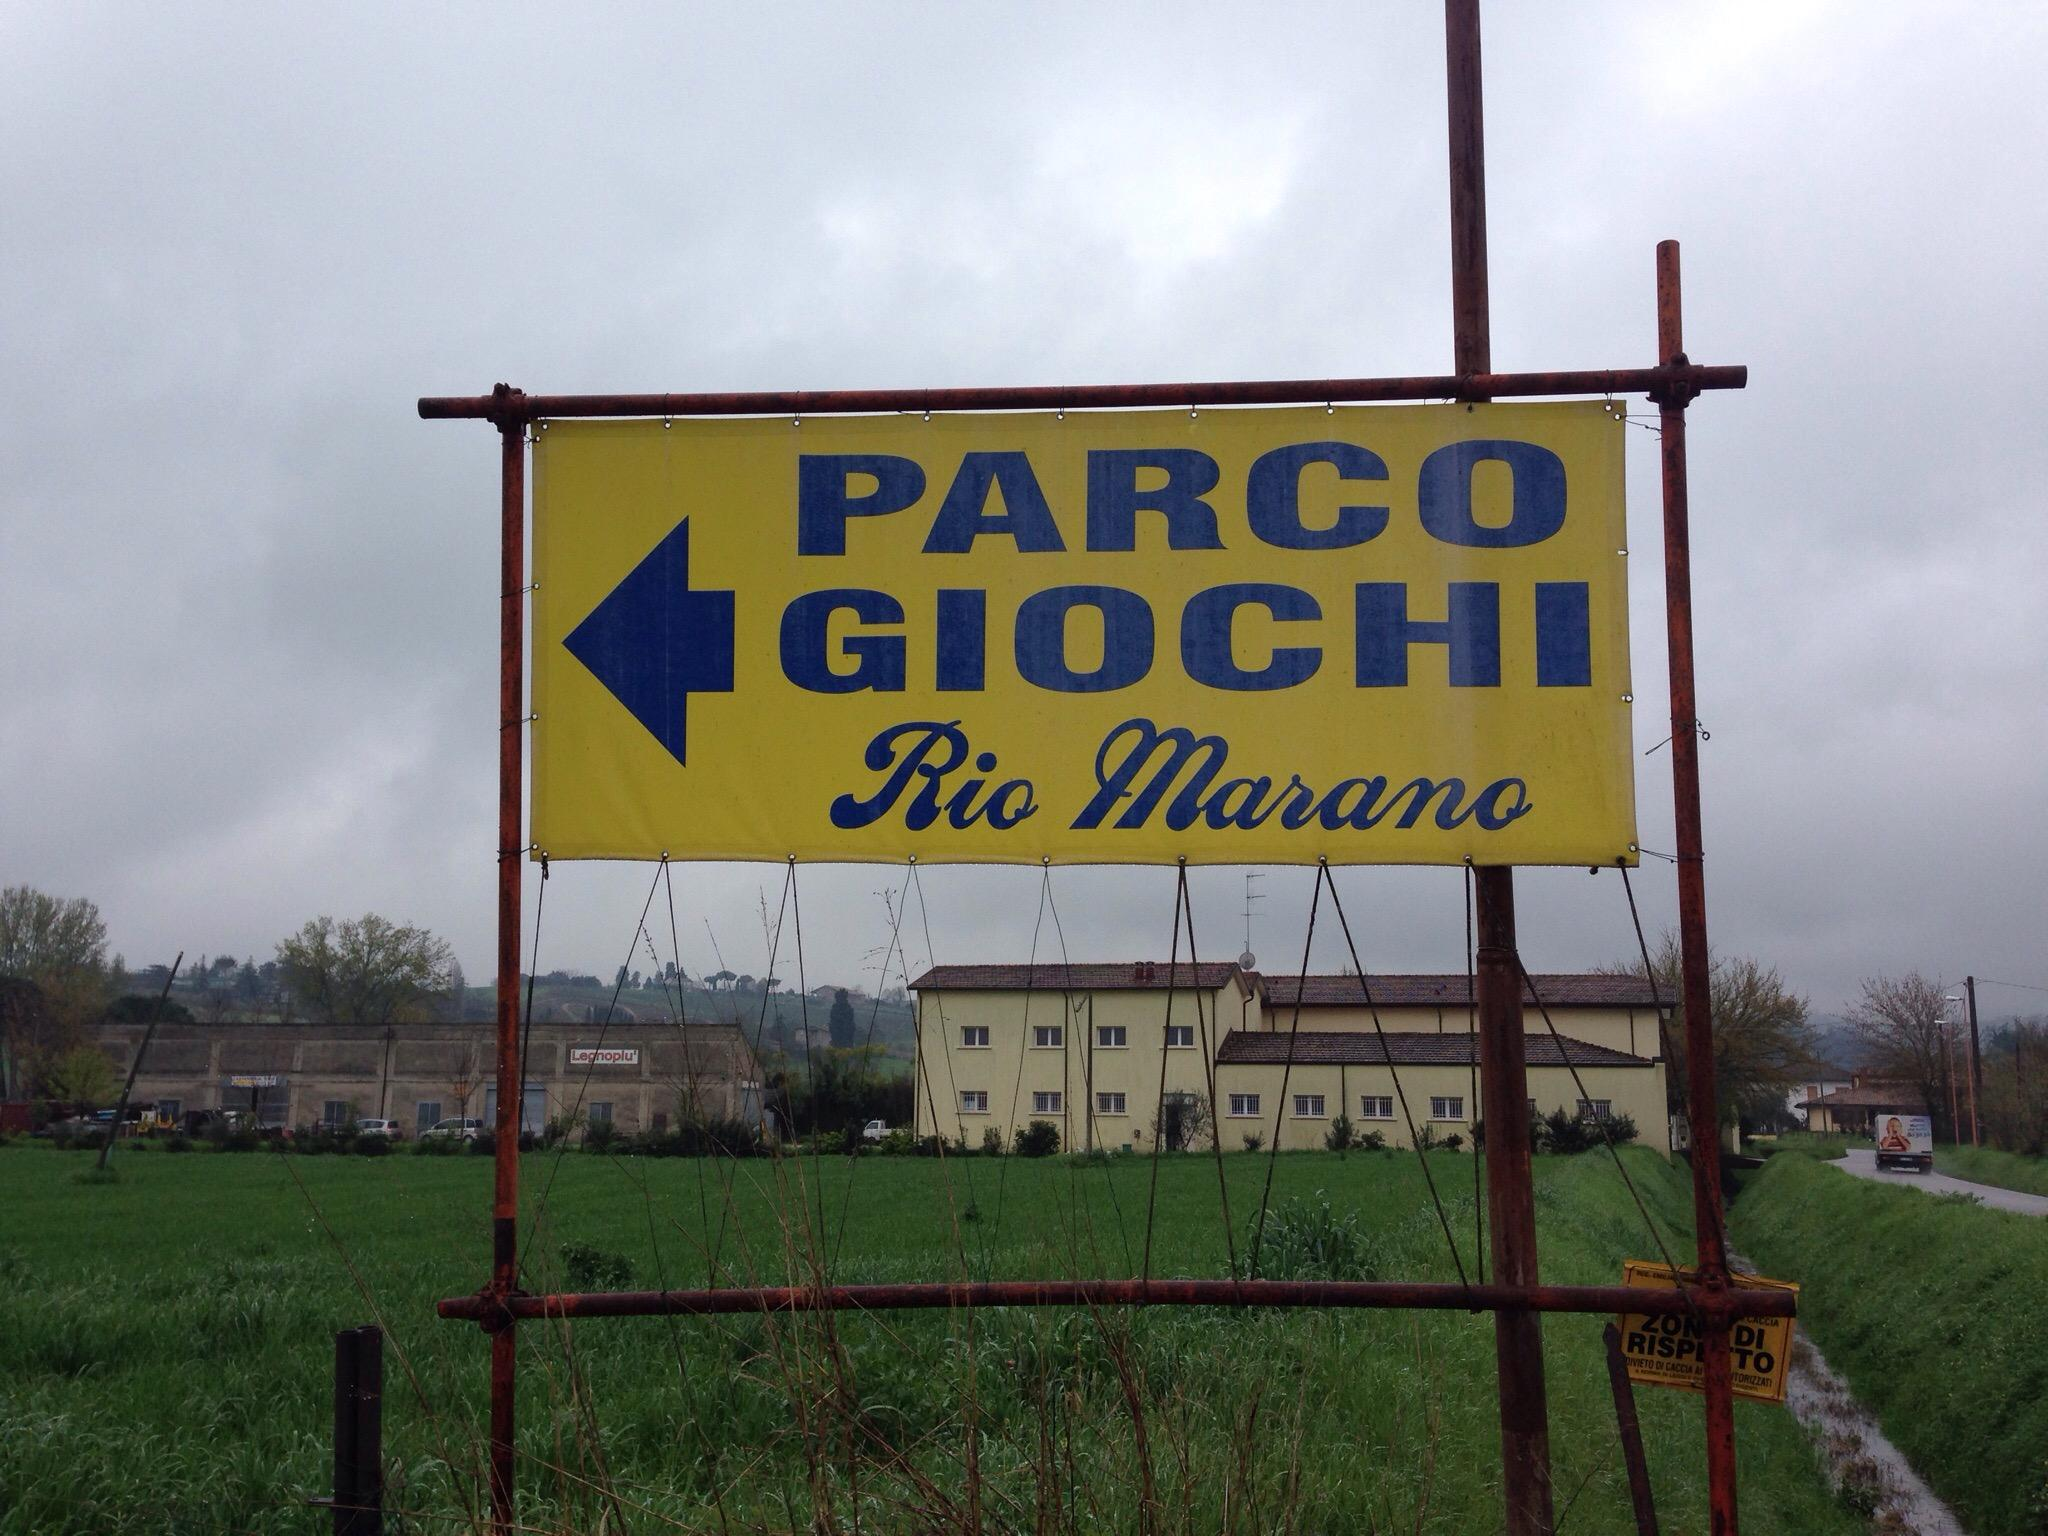 Parco Rio Marano